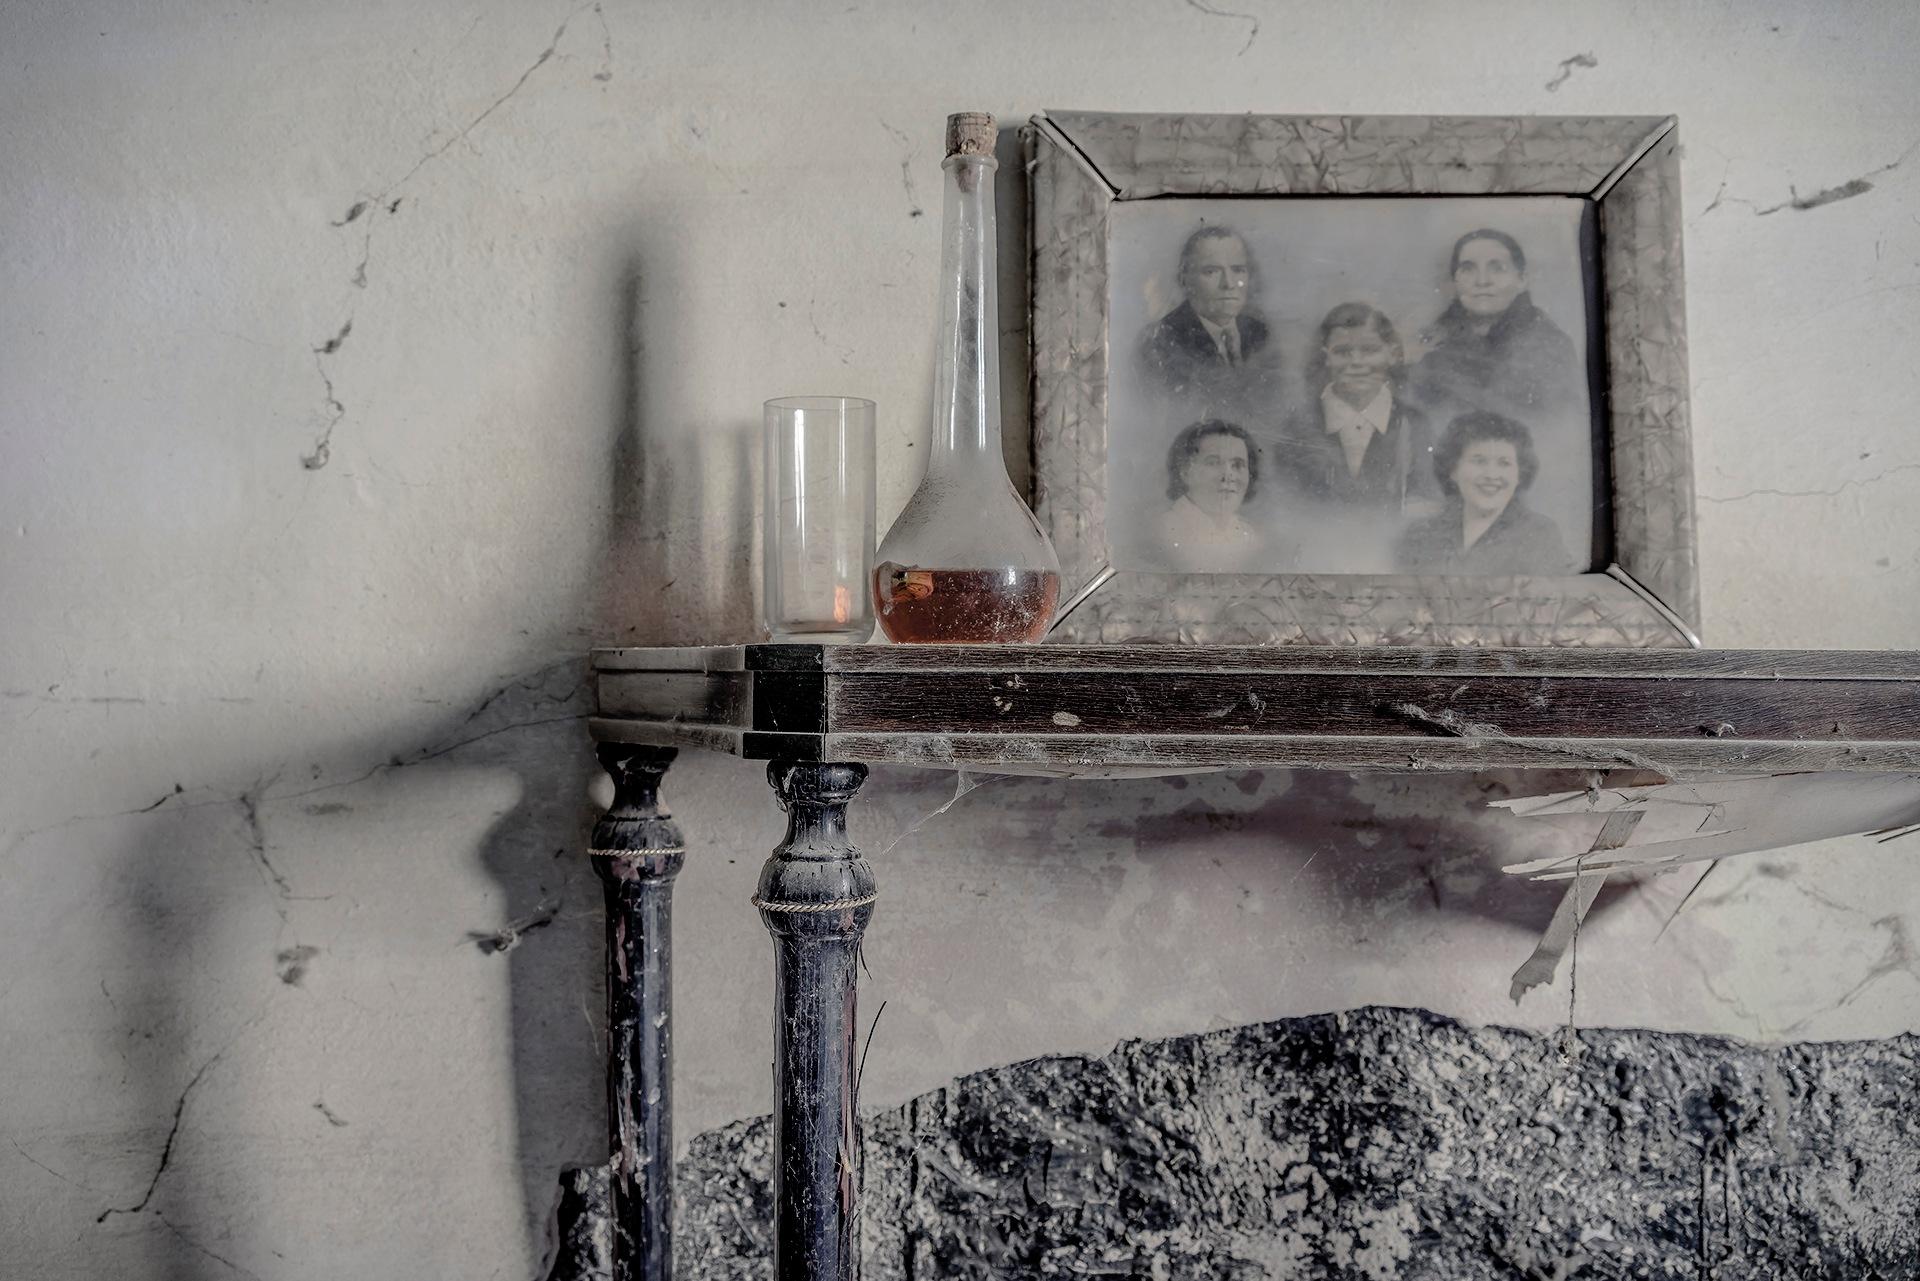 Family, blood, powder by Luca Fontana